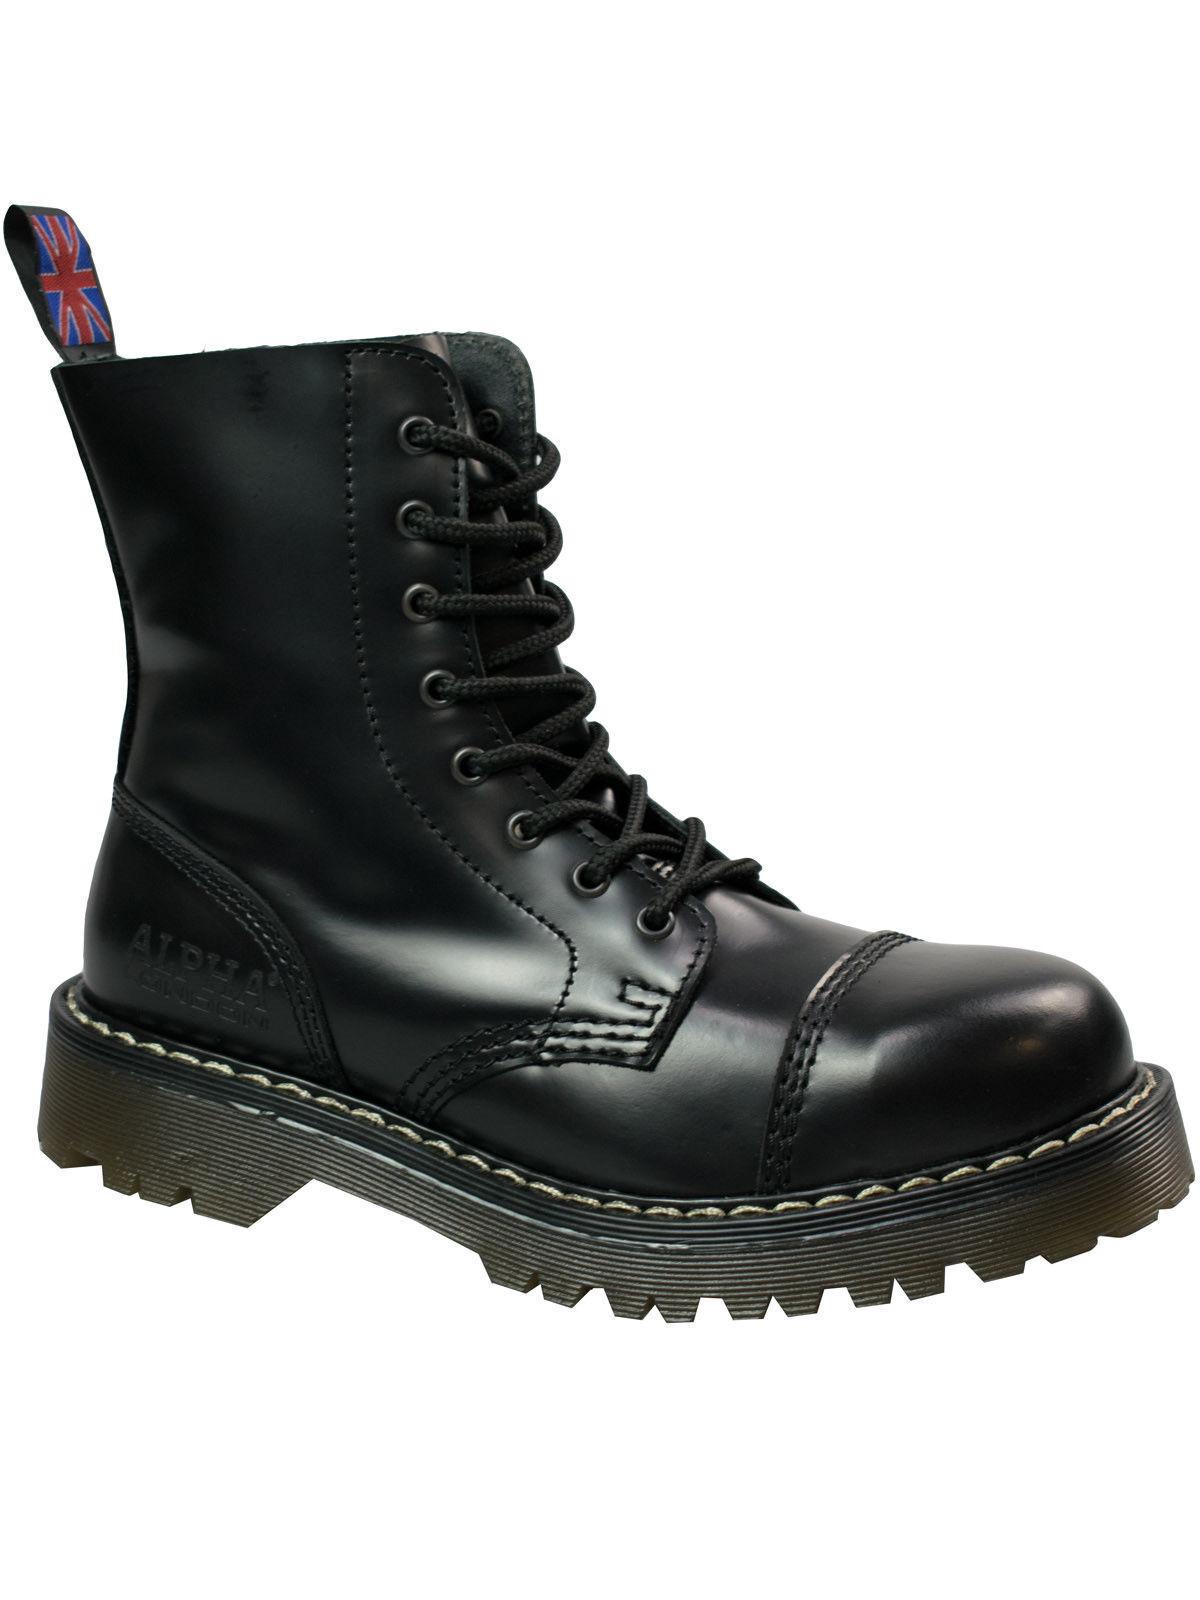 Alpha London 8-loch Boot 4160 Mit Stahlkappe Beige Sohle / Beige Naht #5051